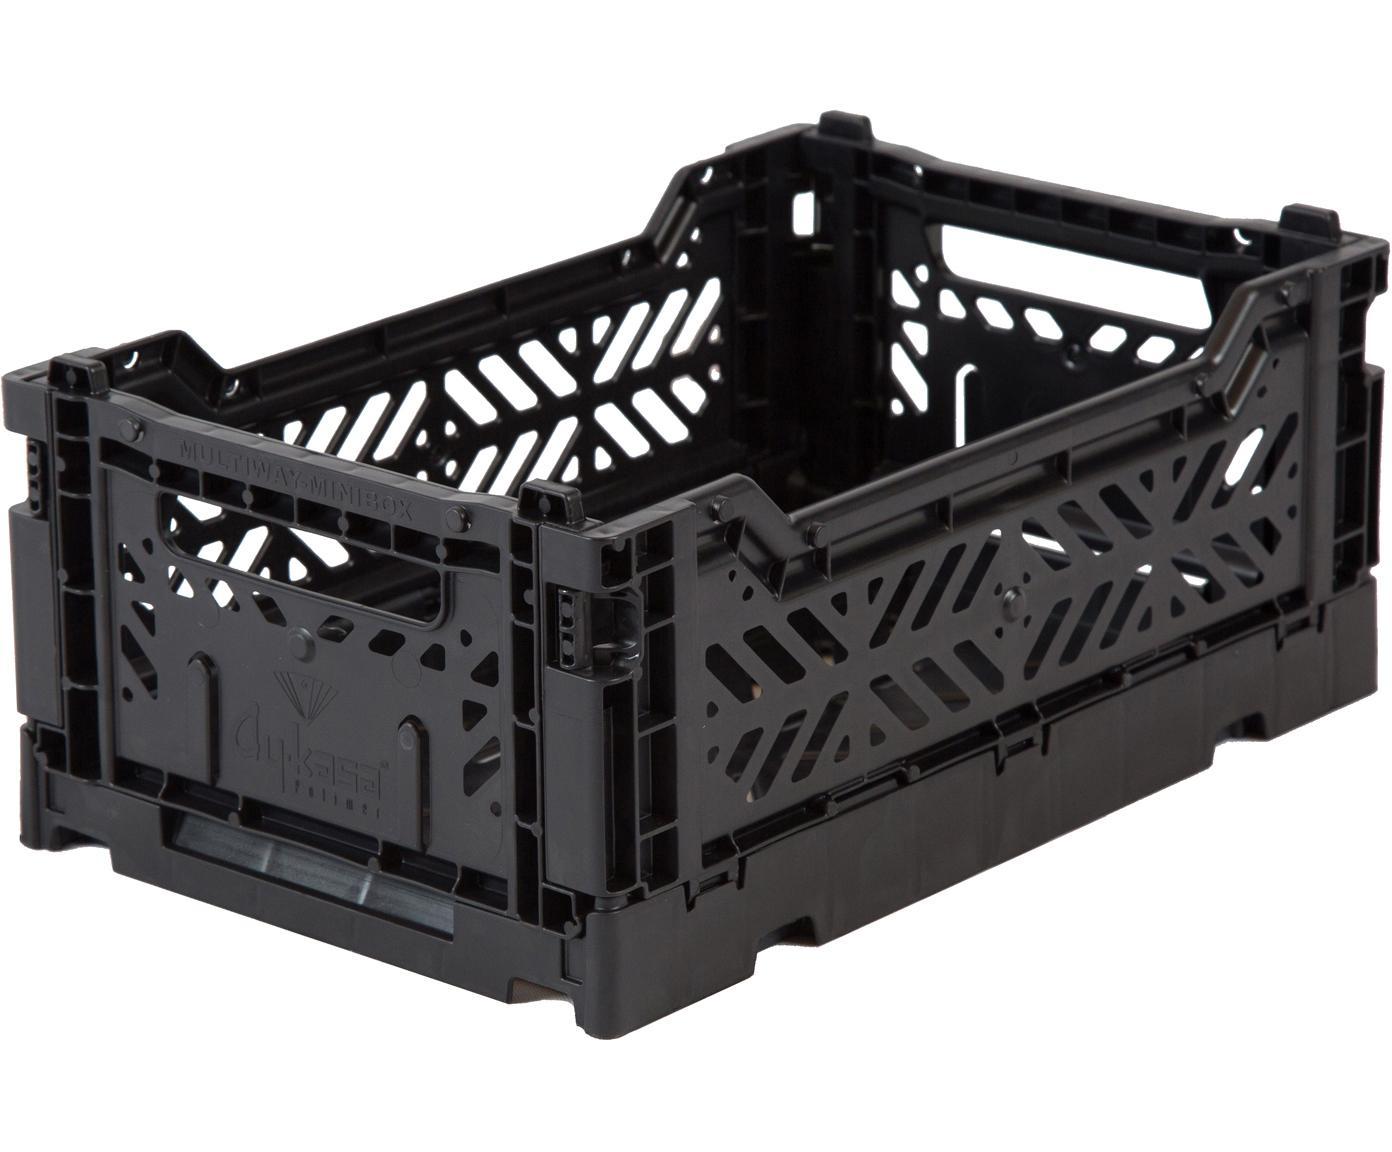 Klappkiste Black, stapelbar, klein, Recycelter Kunststoff, Schwarz, 27 x 11 cm